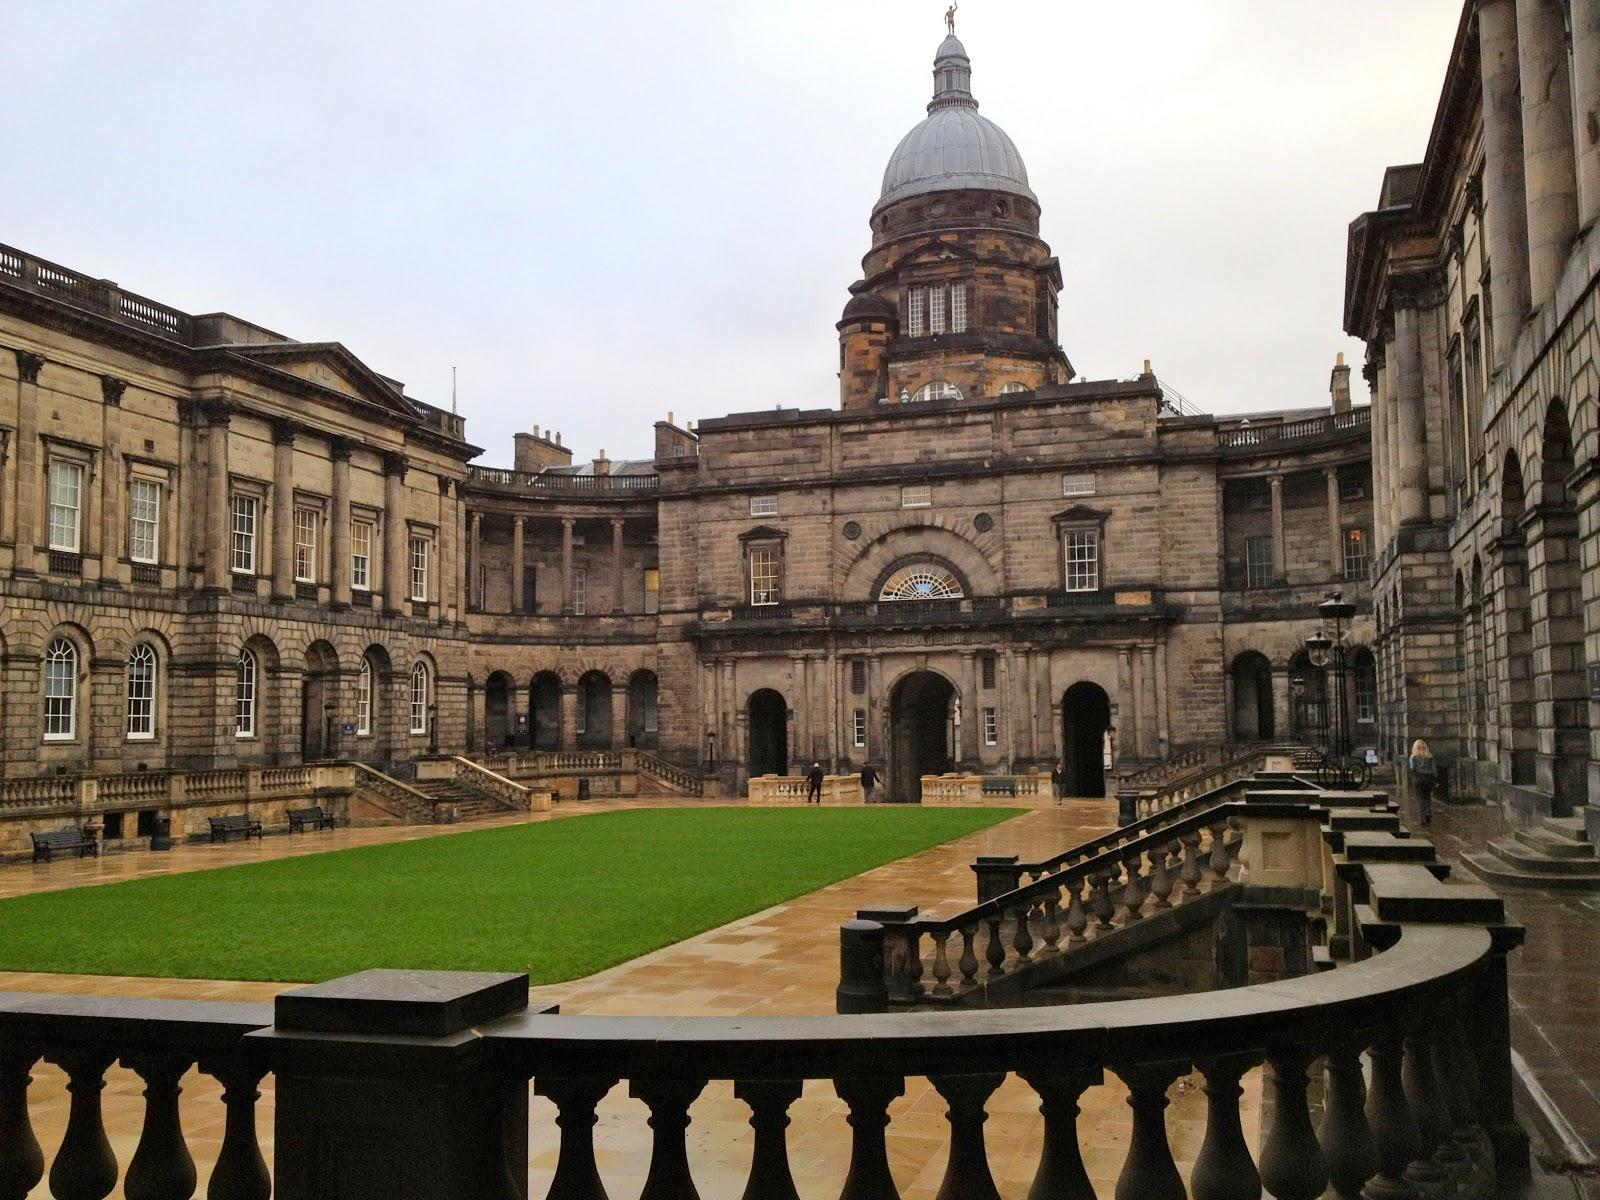 http://1.bp.blogspot.com/-td_DhsYzb1g/UKGtMdk1bhI/AAAAAAAACcM/D7RzNiZFa0w/s1600/Old+College+University+of+Edinburgh+(3264+x+2448).jpg